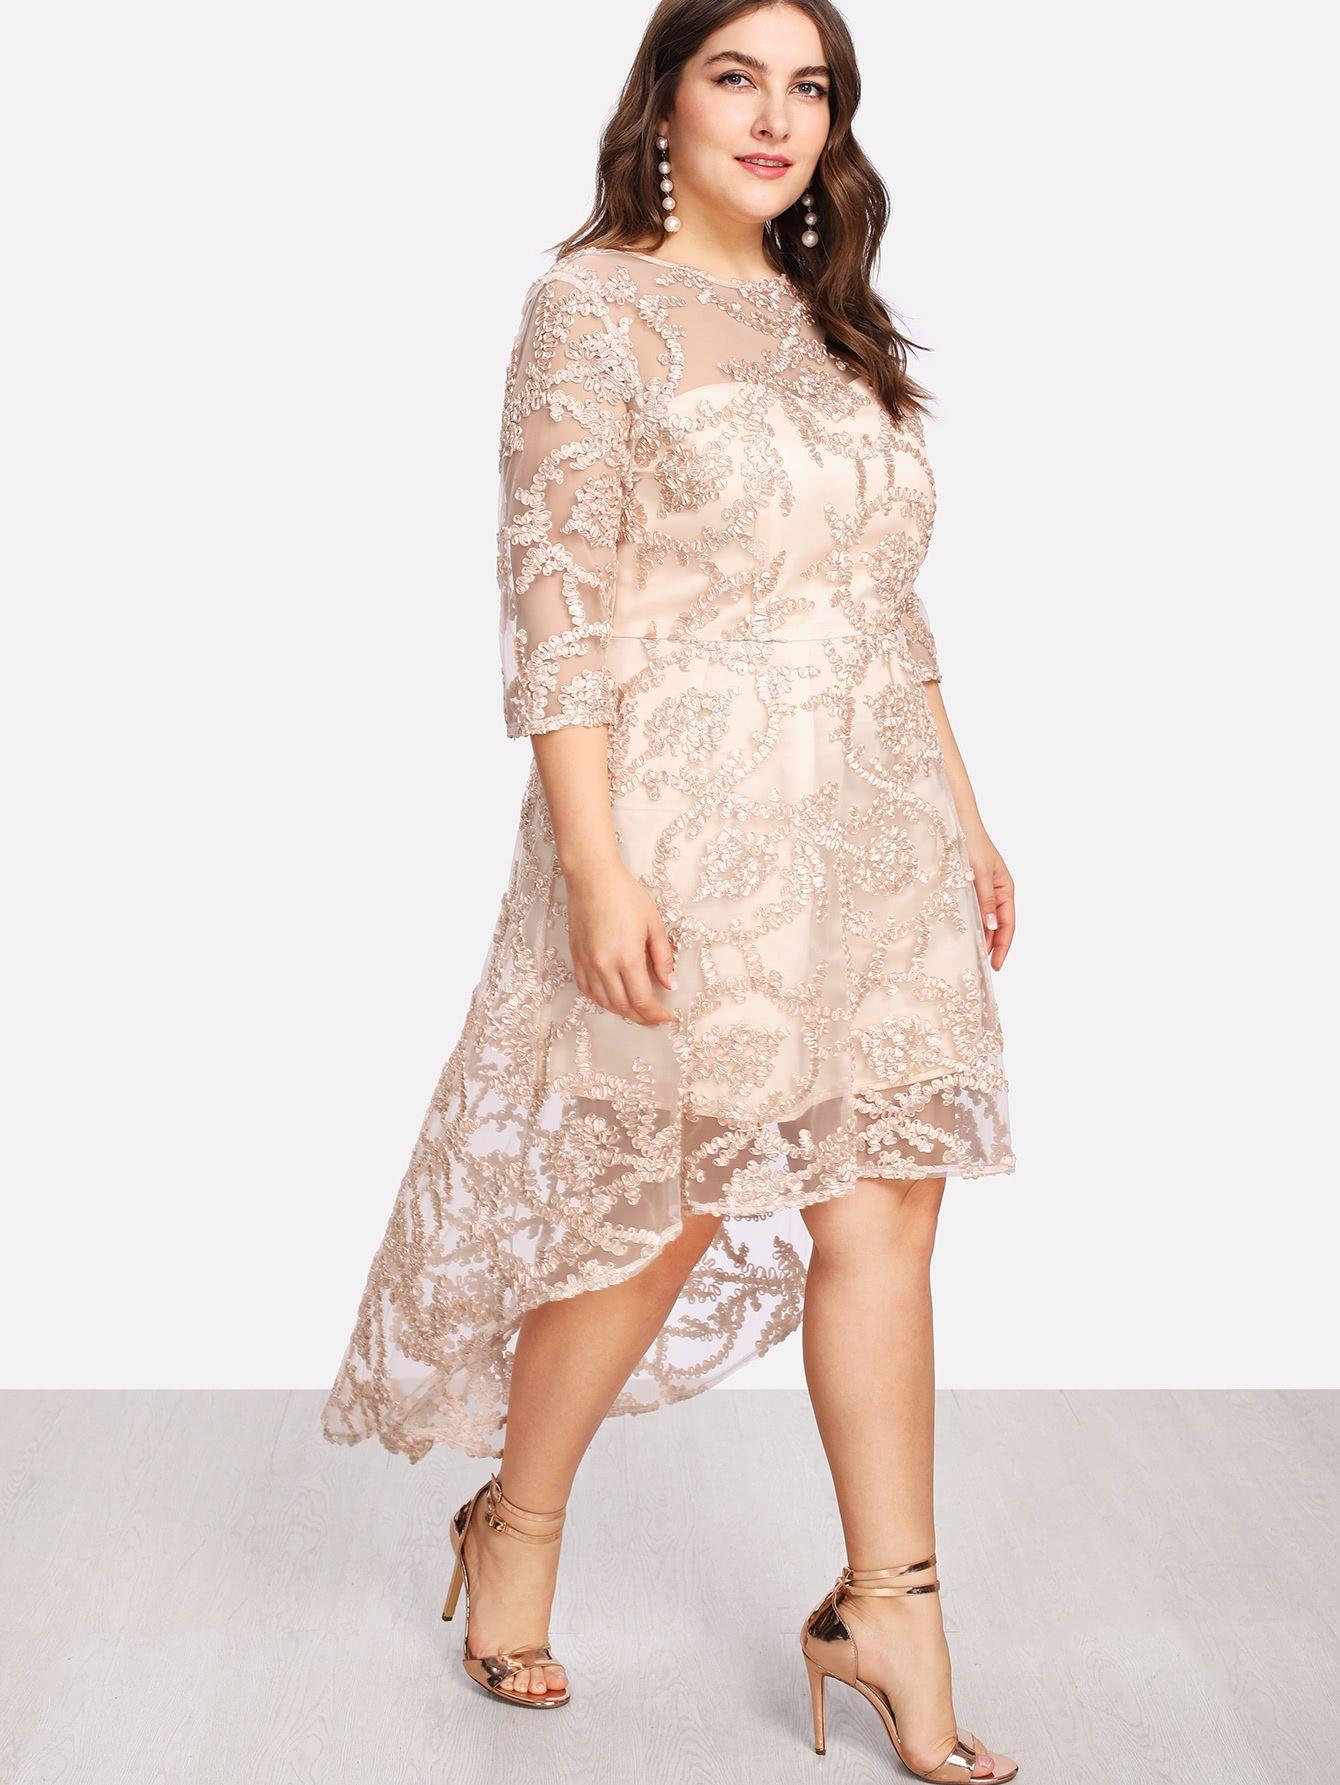 Applique Mesh Overlay Dip Hem Dress Plus Size Dresses Hem Dress Three Quarter Length Sleeve Dress [ 1785 x 1340 Pixel ]